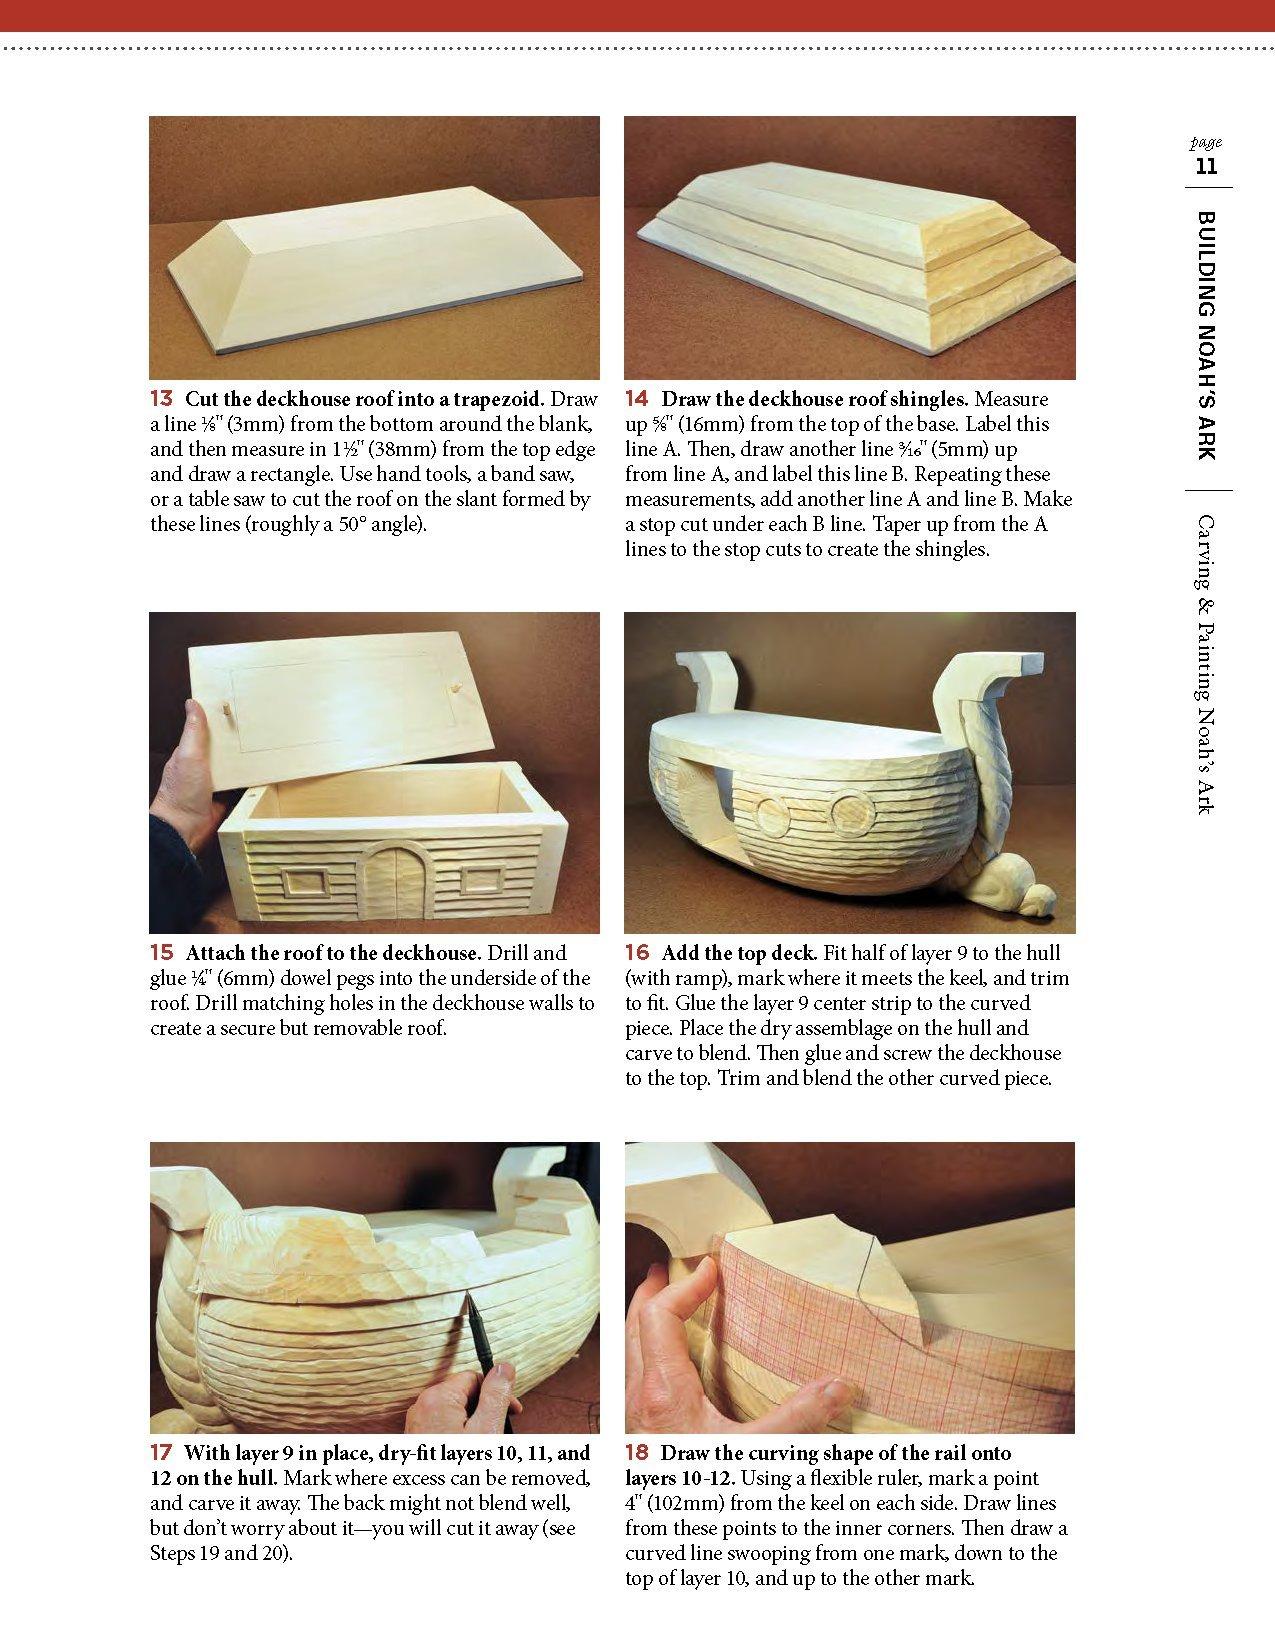 Carving & Painting Noah's Ark: Easy-Build Ark Plans Plus